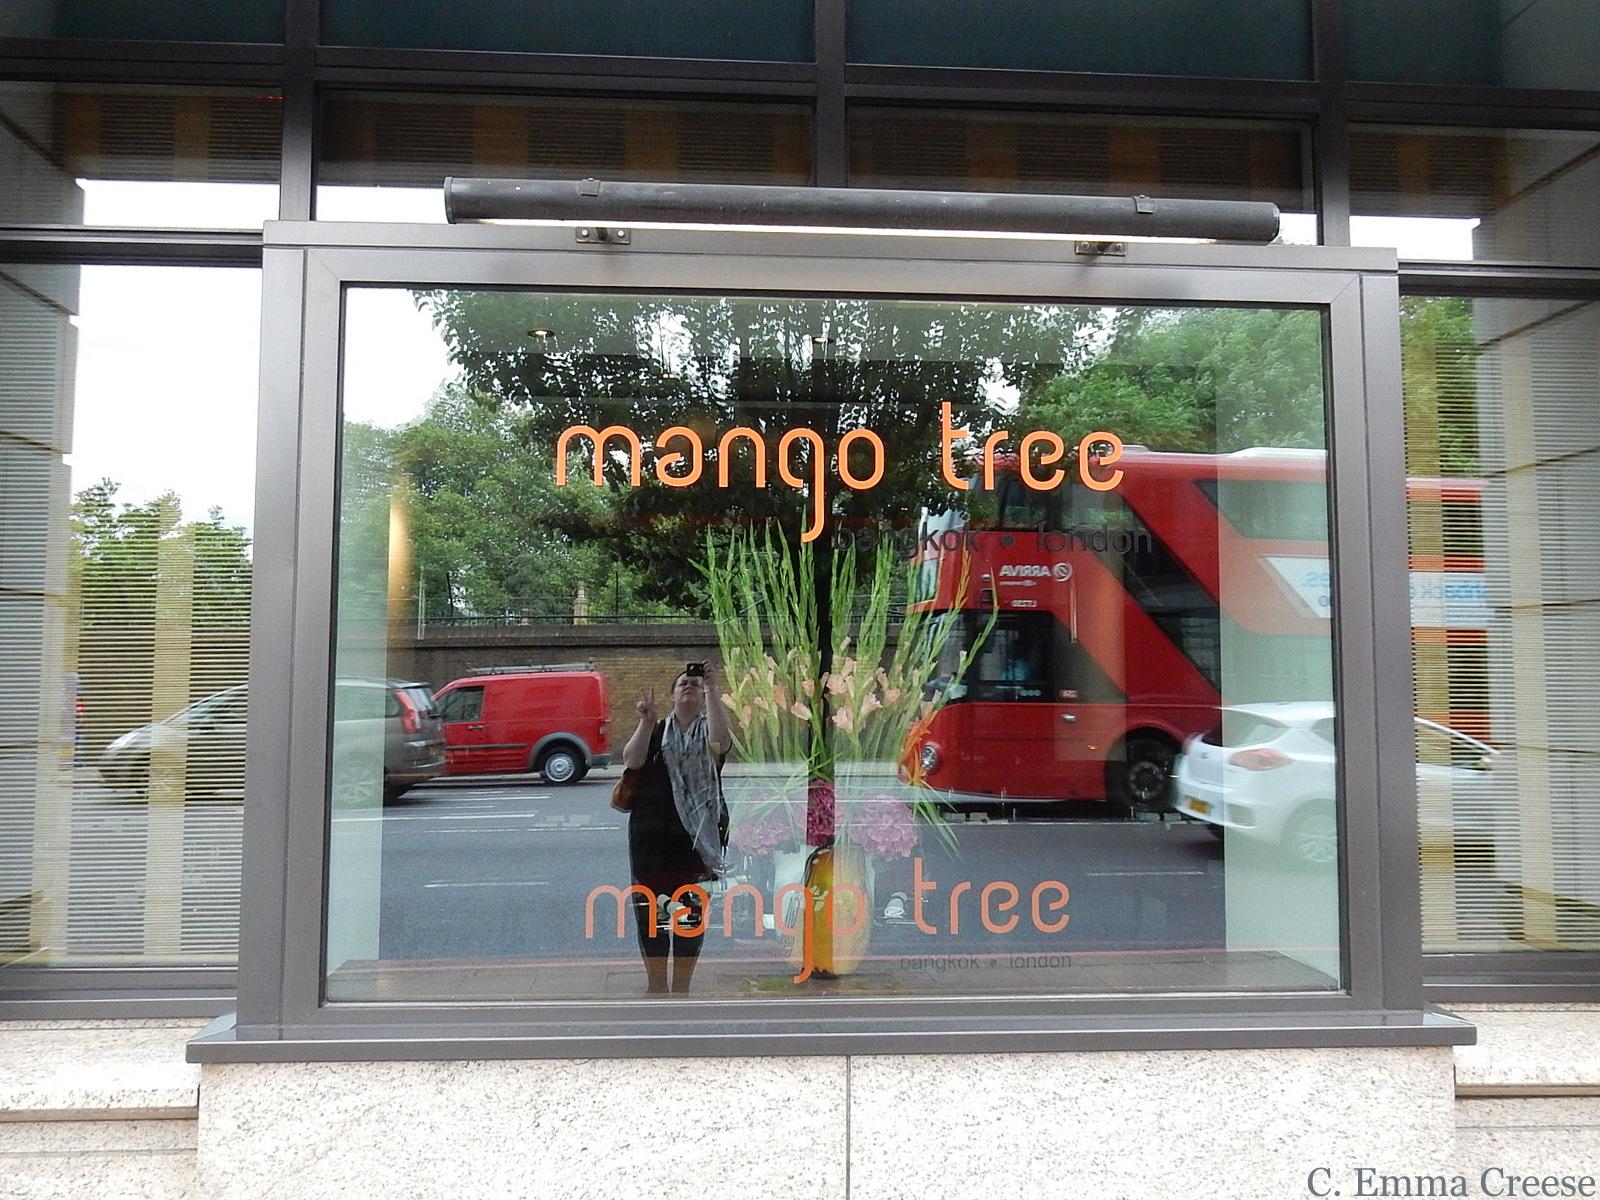 Restaurant Review Mango Tree Belgravia Adventures of a London Kiwi